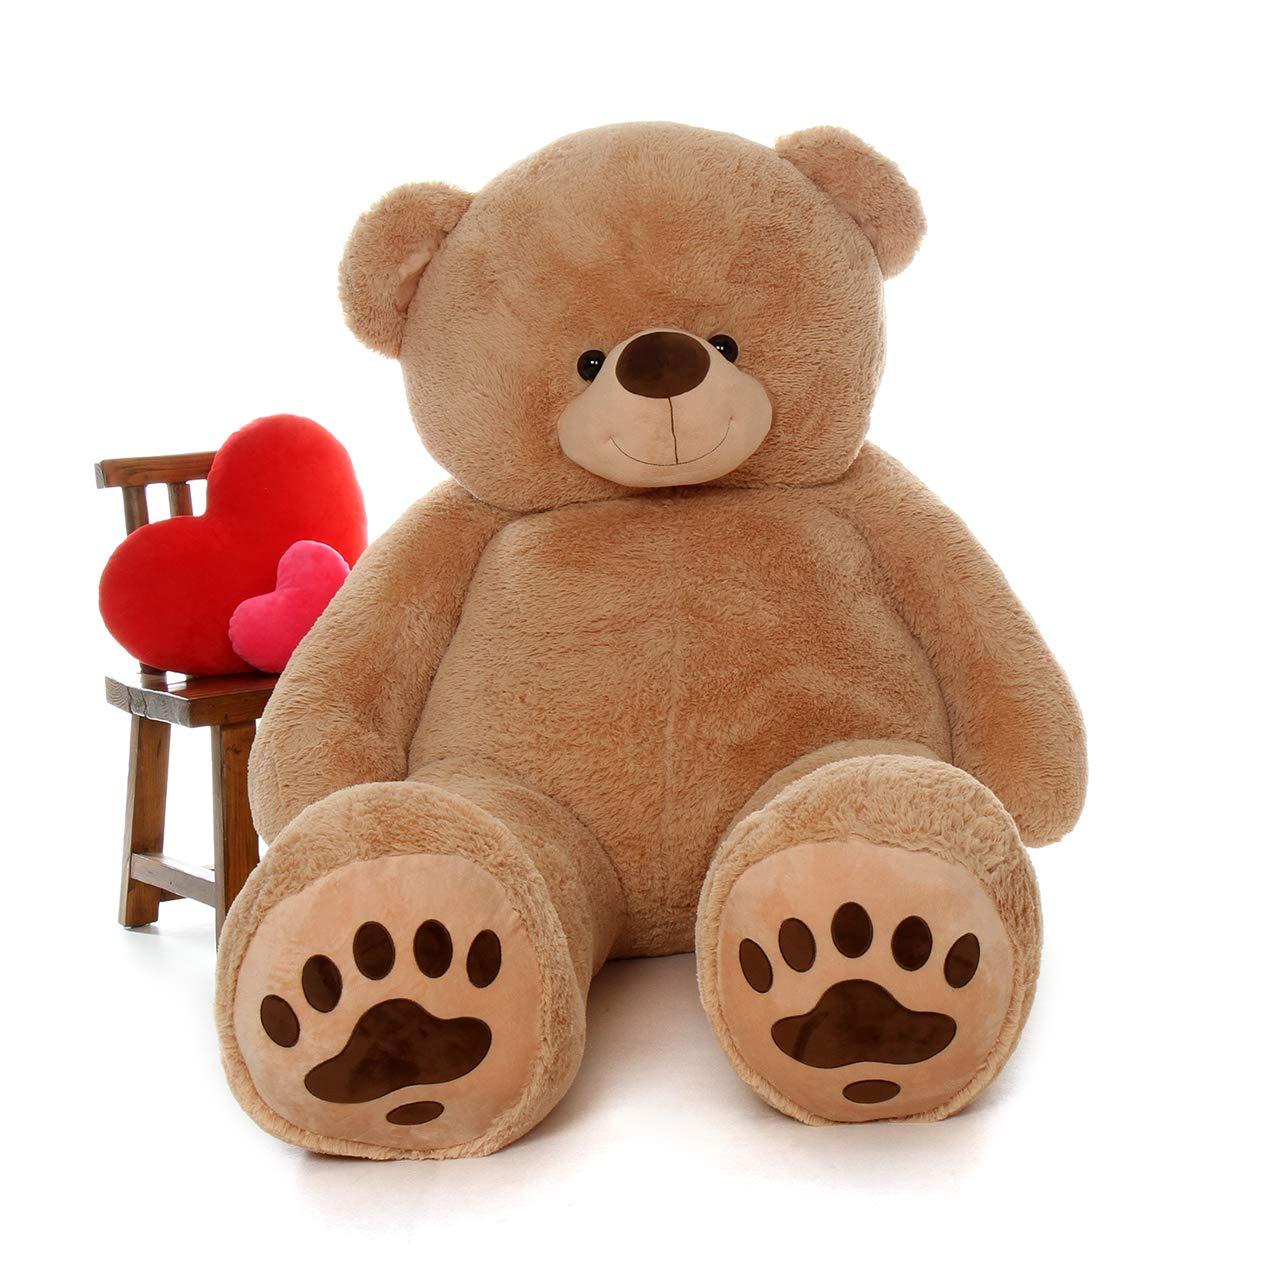 f84b196580a Amazon.com  Giant Teddy Brand - Premium Quality Giant Stuffed Teddy Bear  (Amber Tan